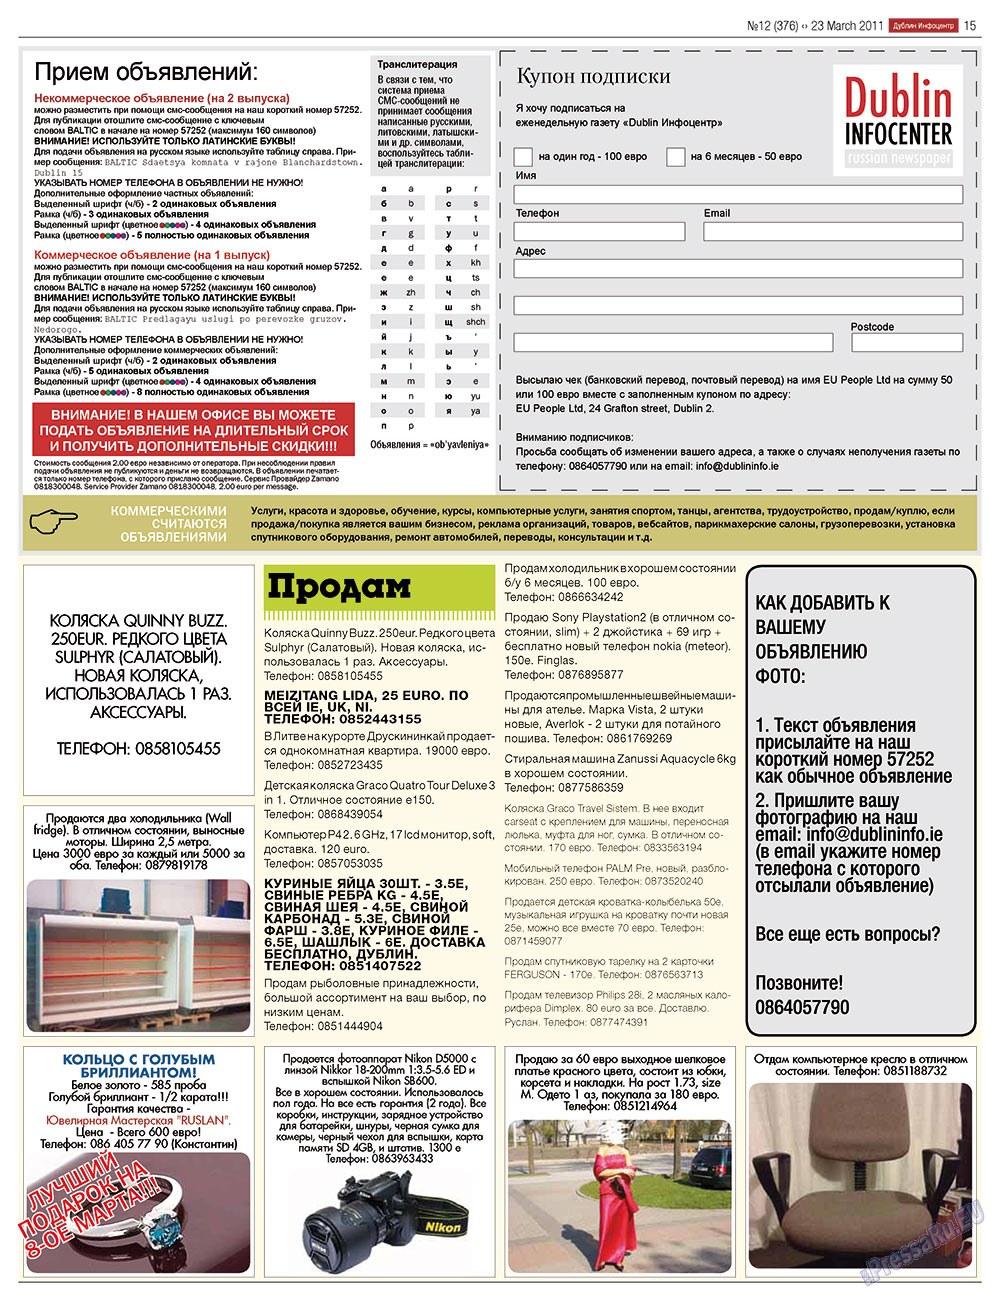 Дублин инфоцентр (газета). 2011 год, номер 12, стр. 15